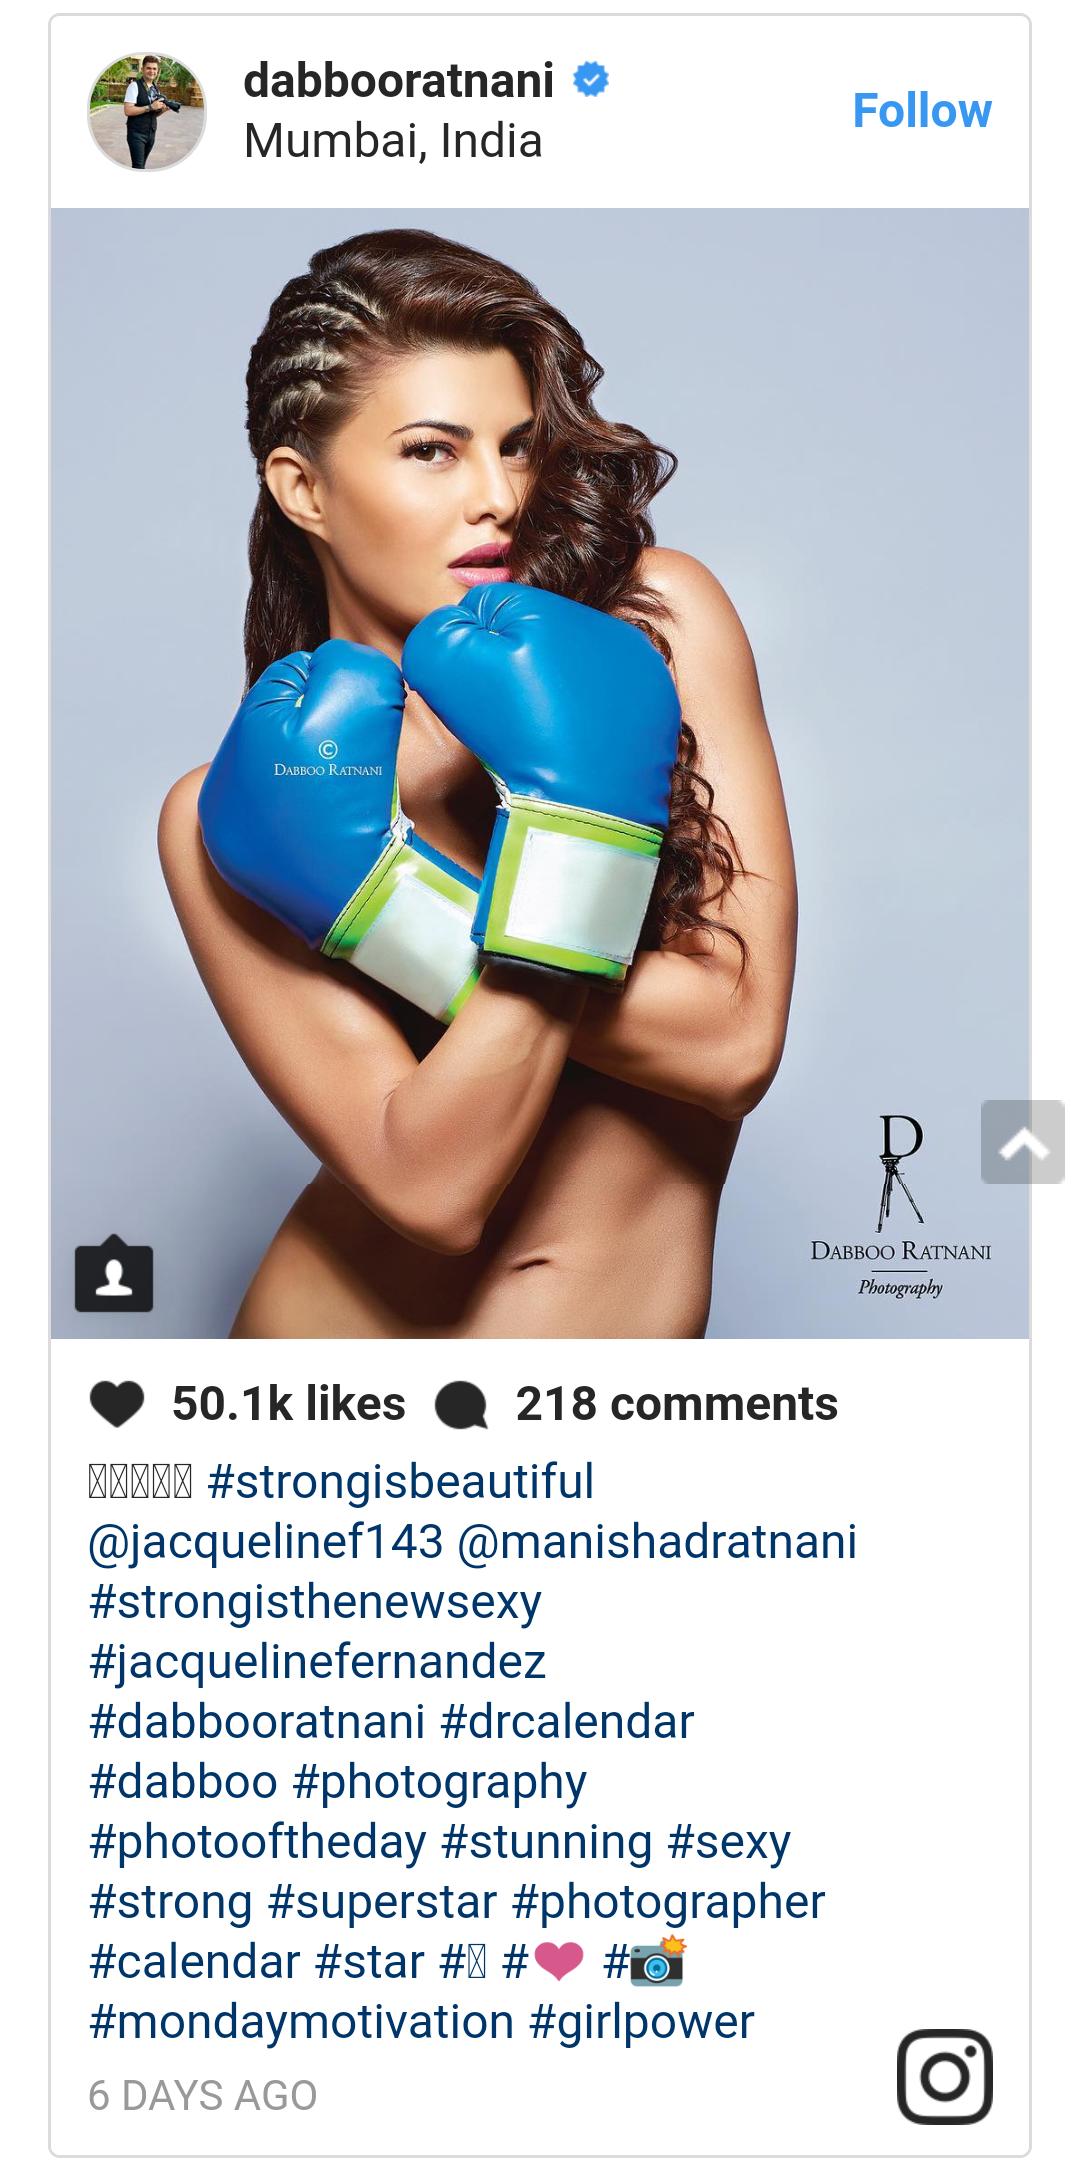 Jacqueline Fernandez Hot Nude Pics jacqueline fernandez in her latest photoshoot has wearing